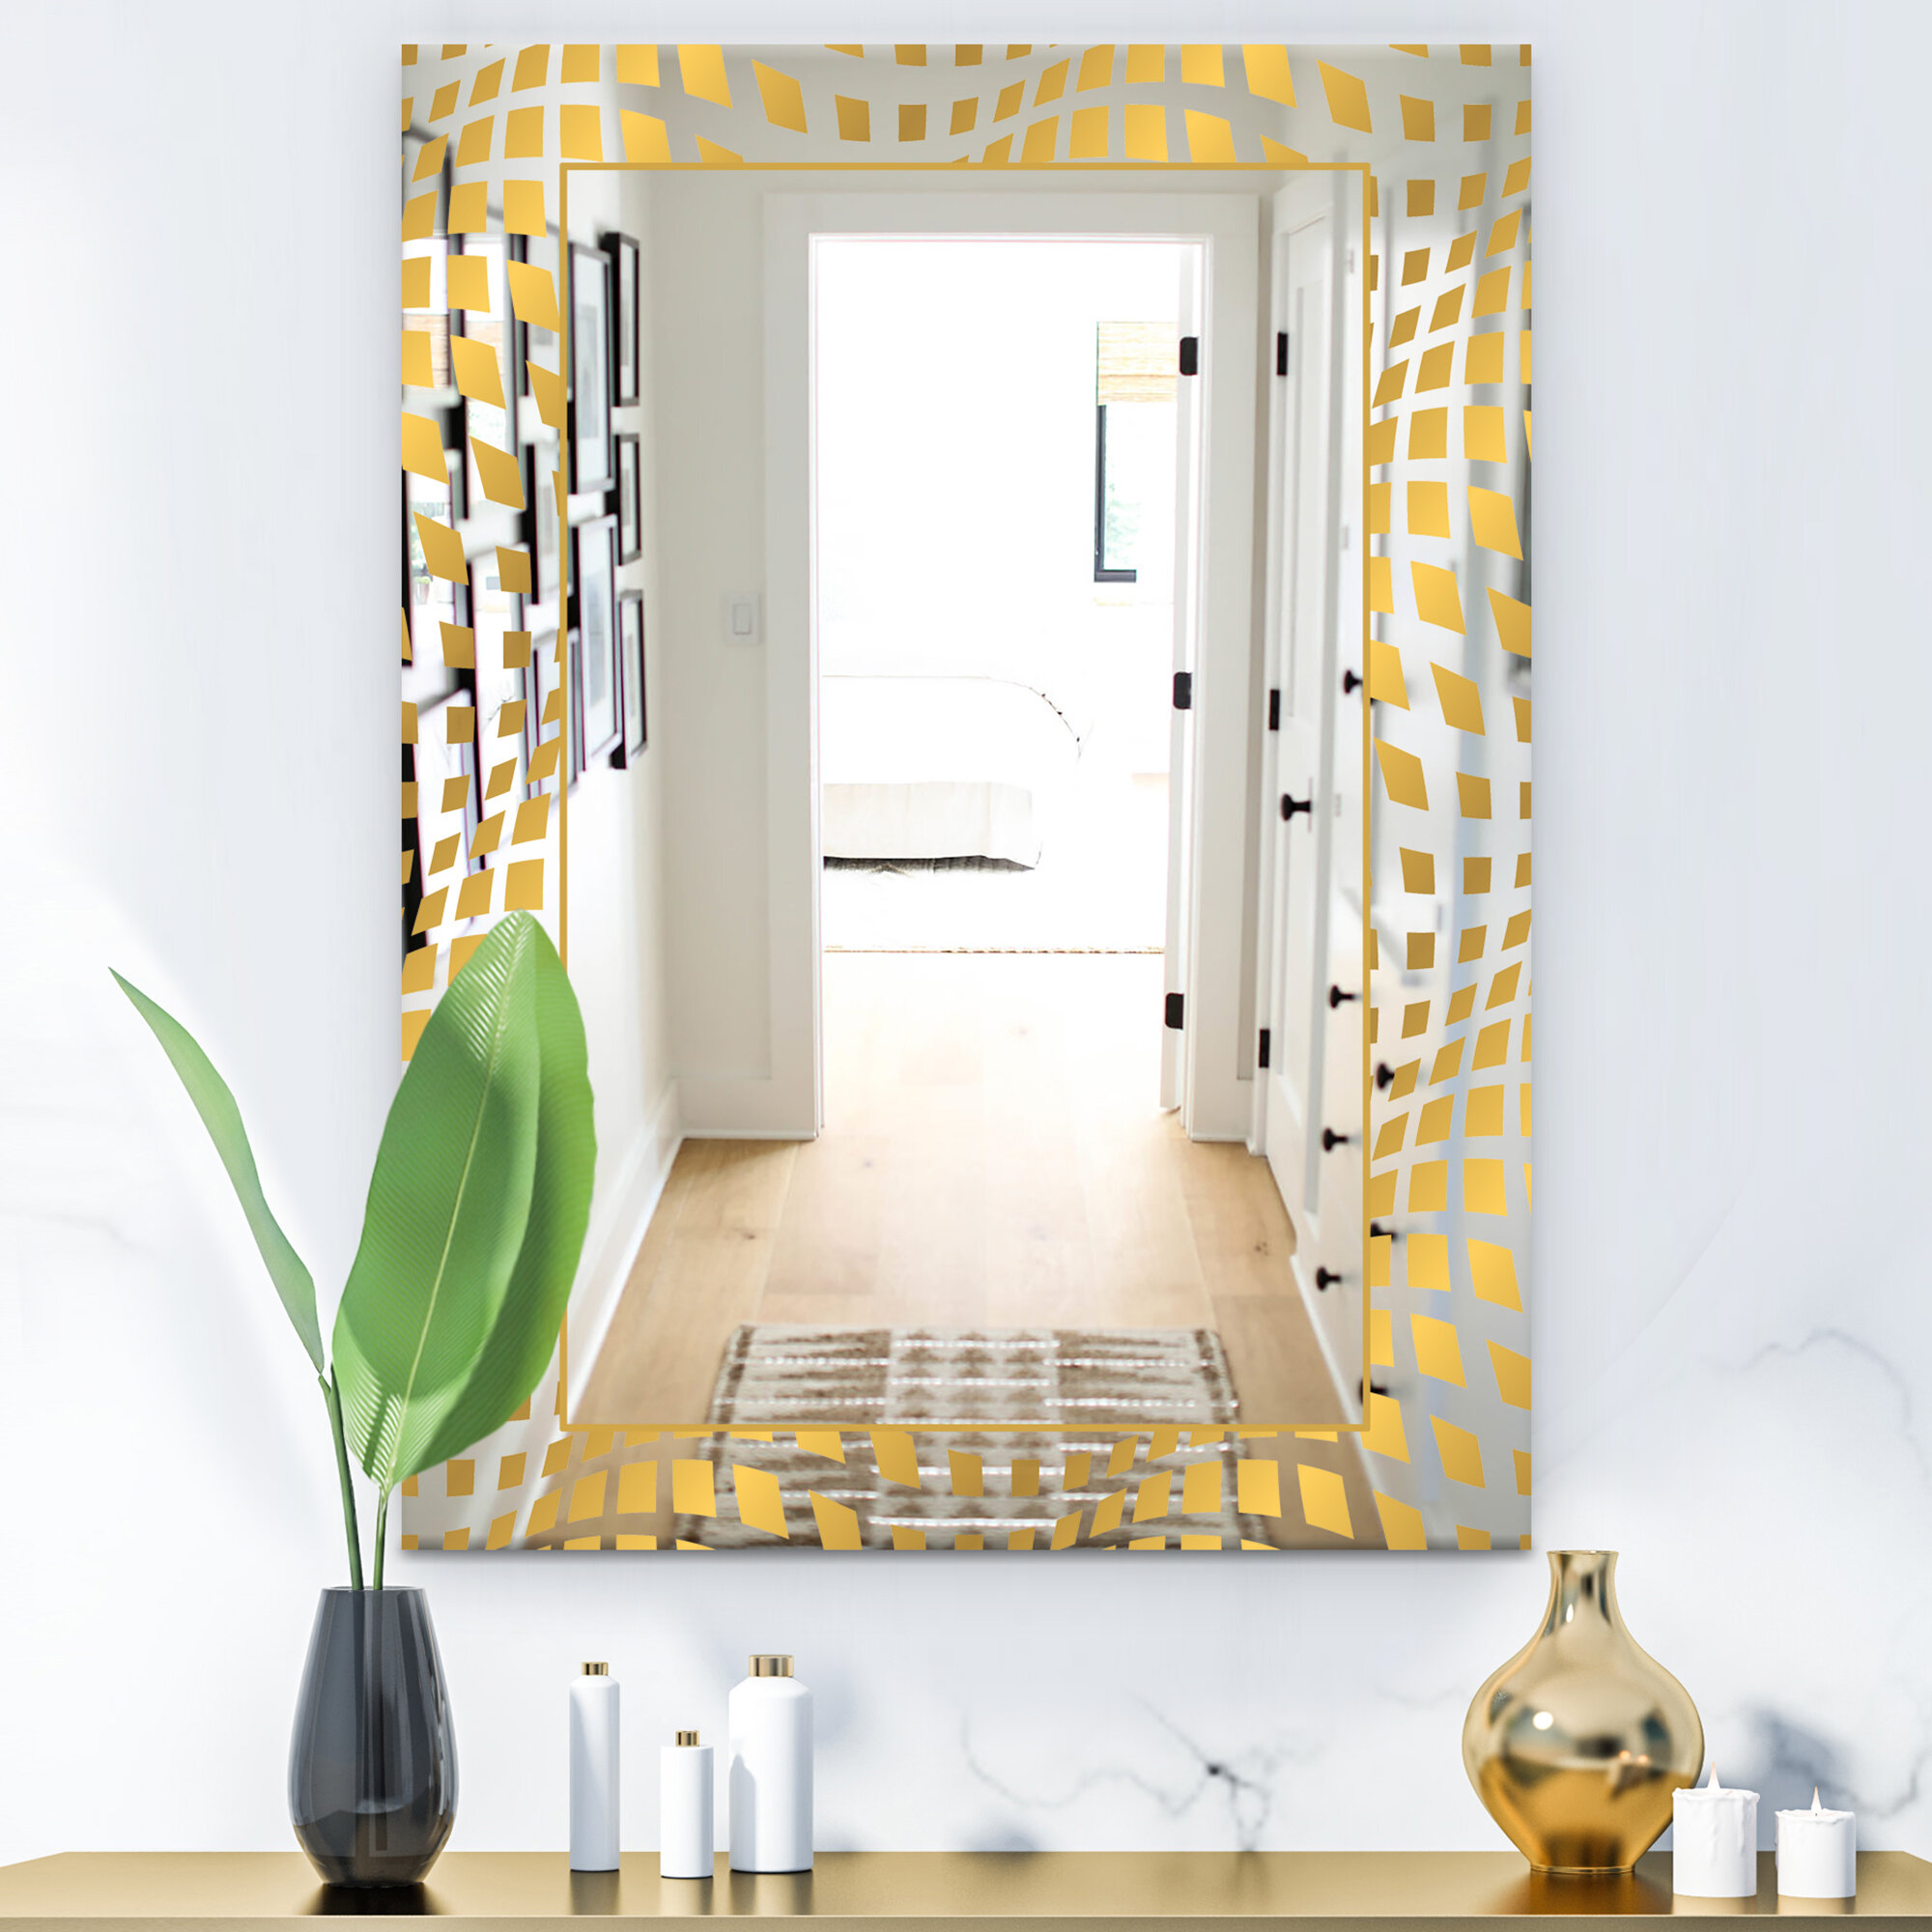 East Urban Home Capital Essential Glam Accent Mirror Wayfair Ca